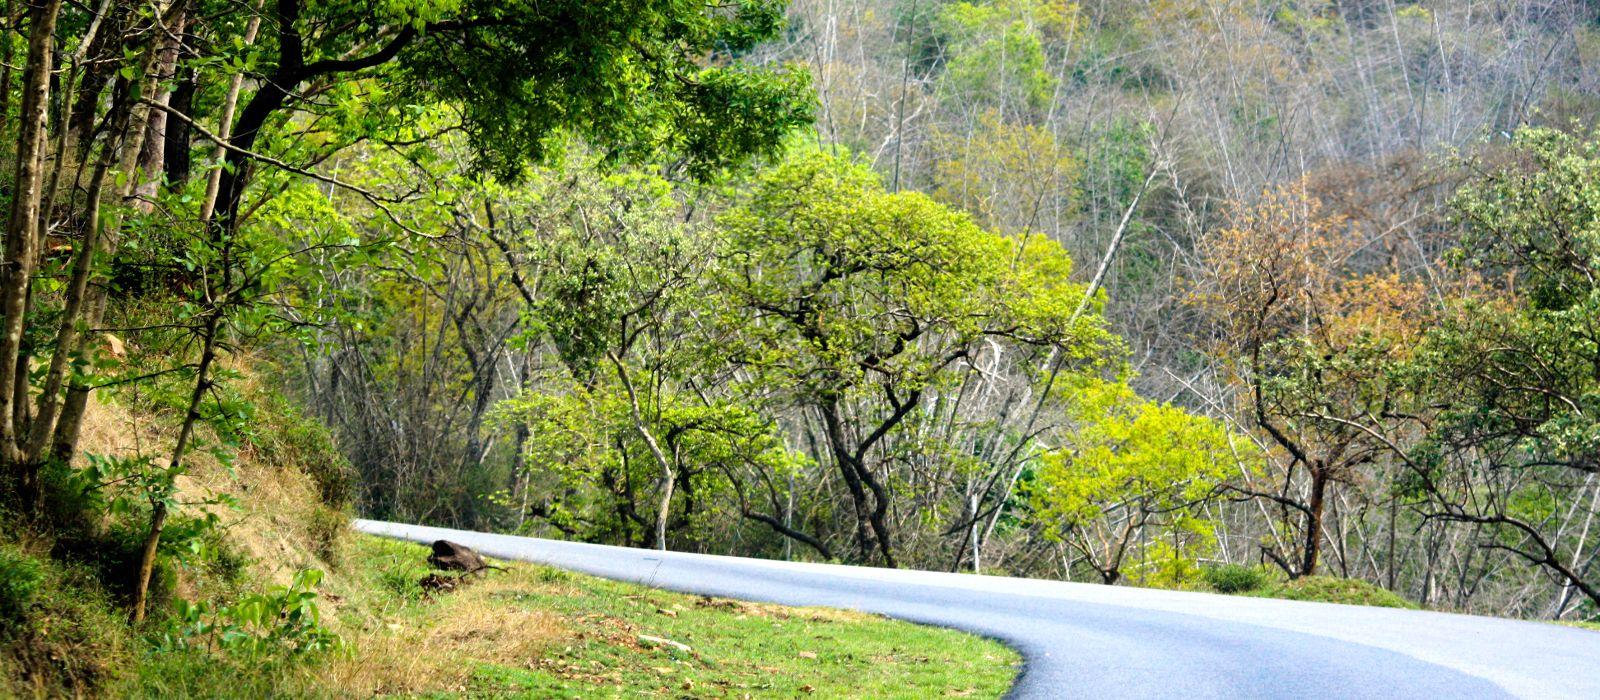 Destination Bandipur South India